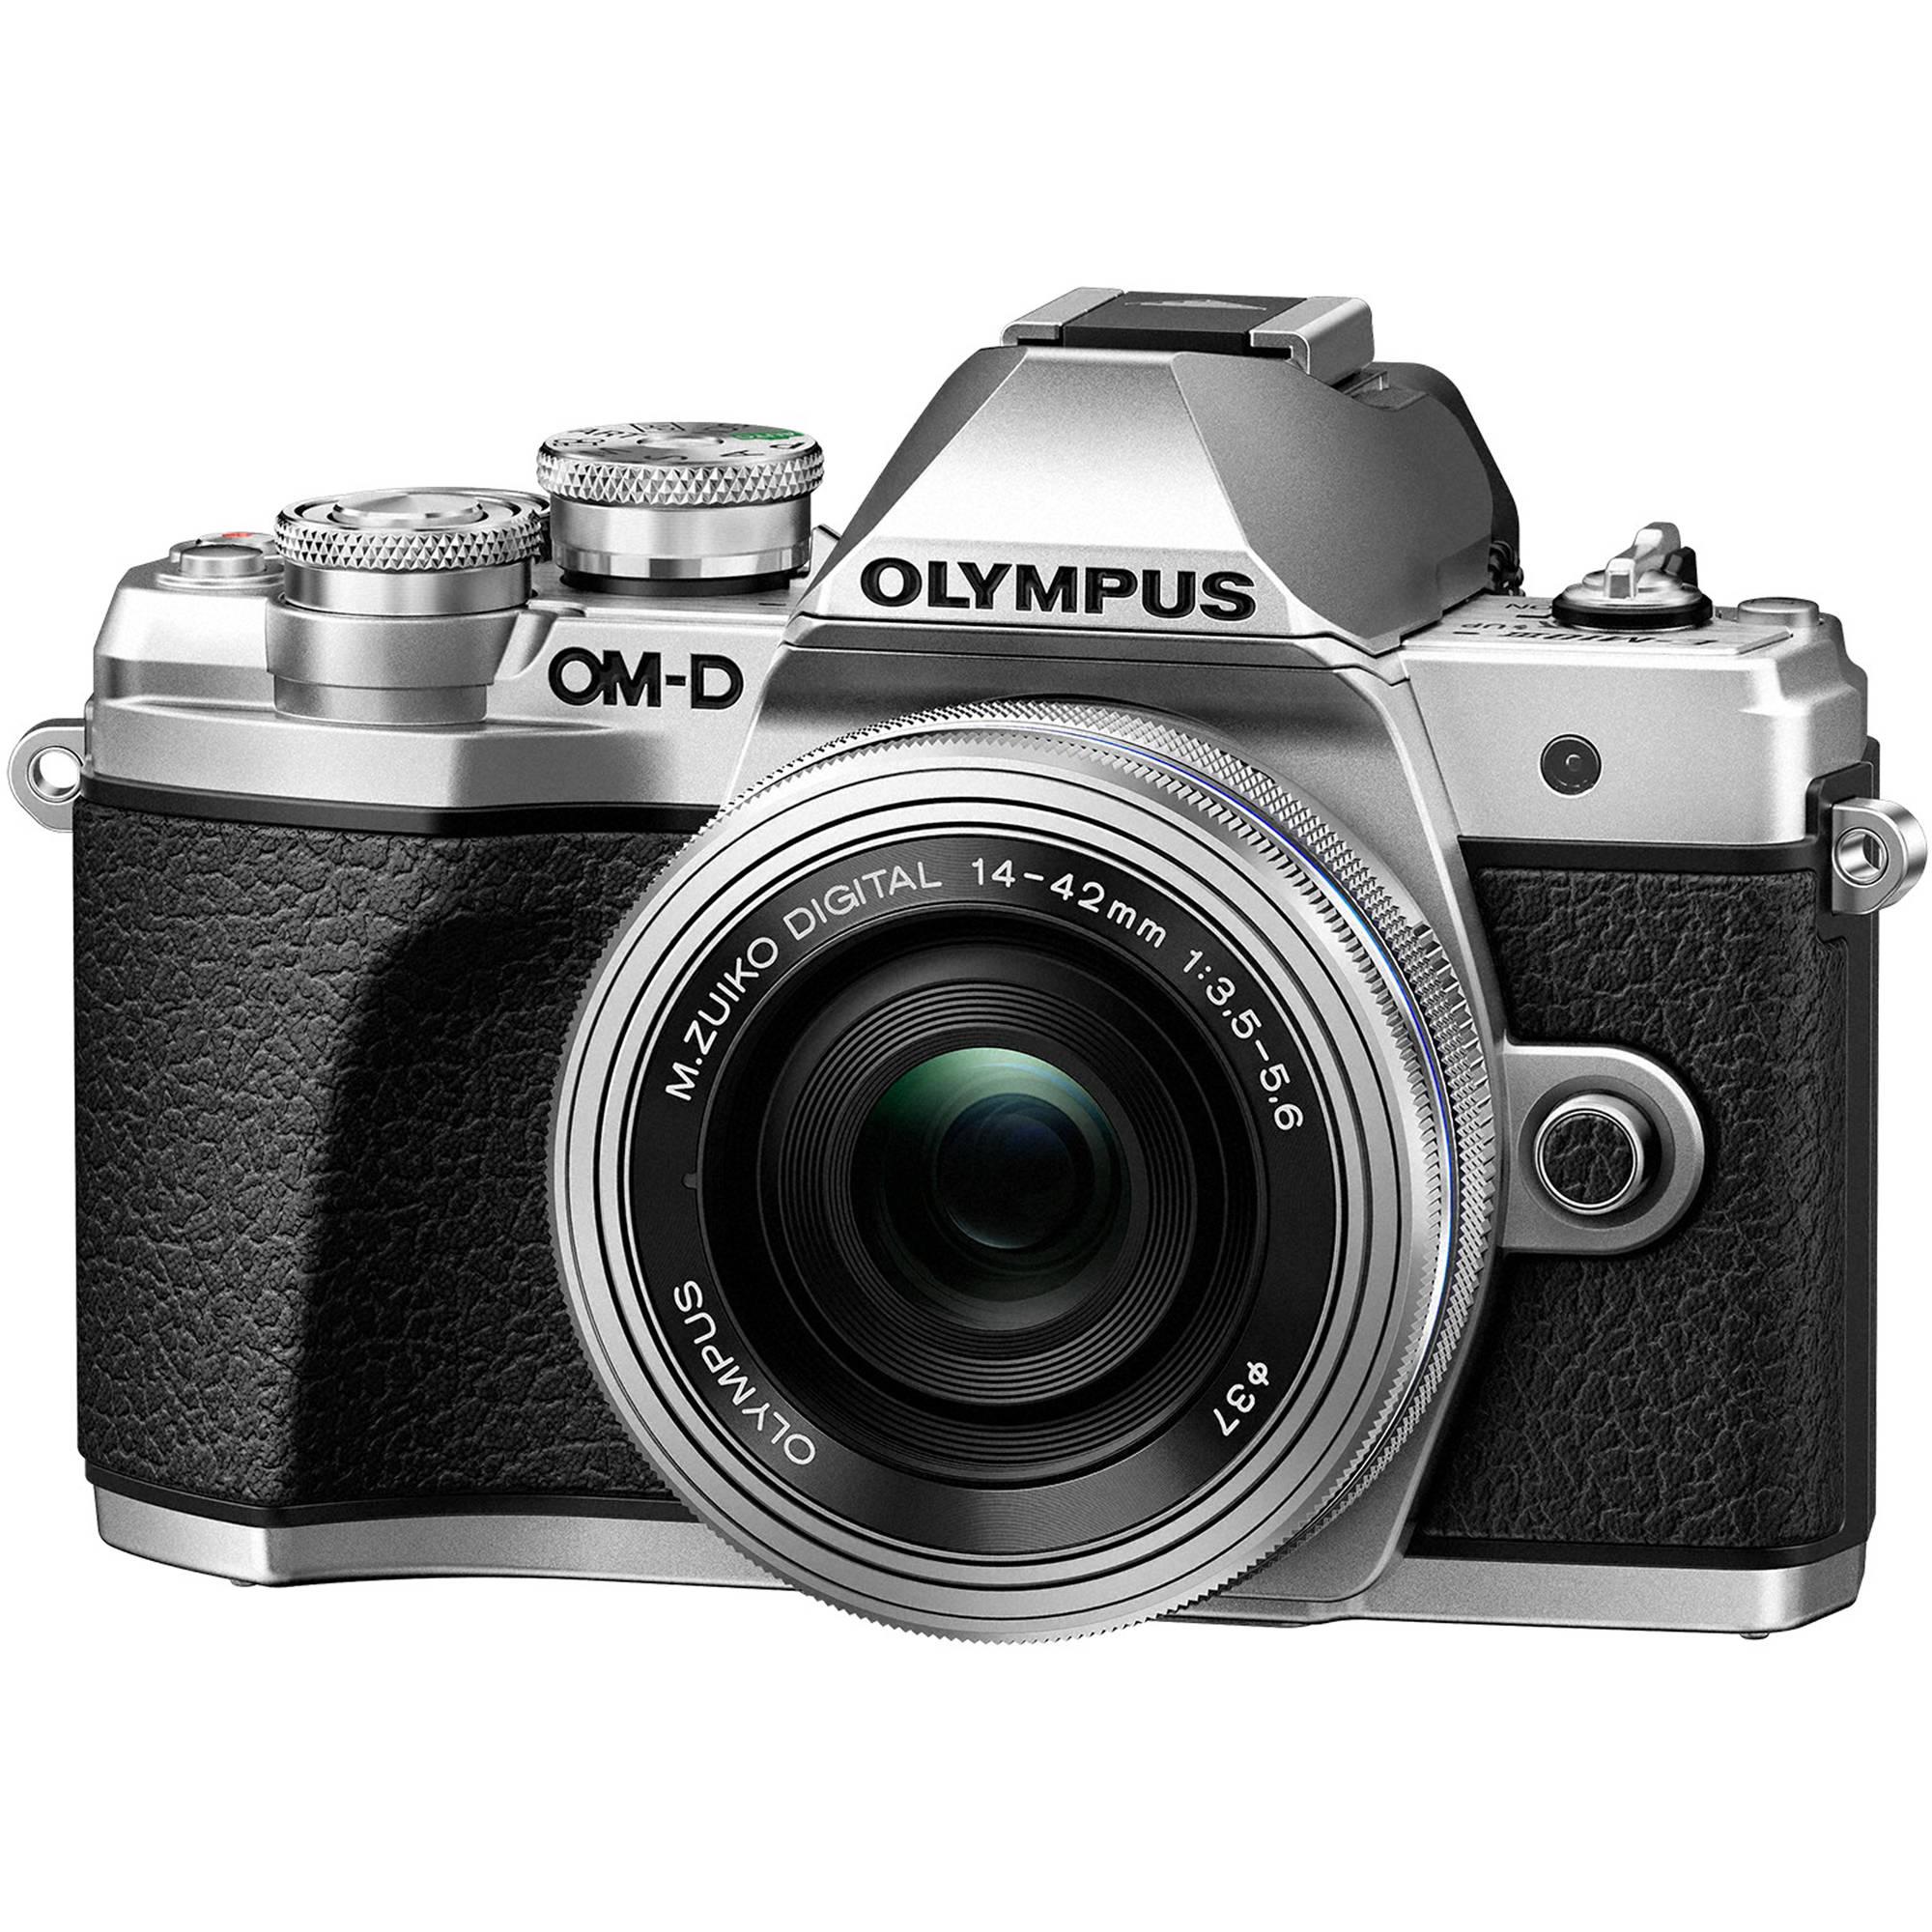 Olympus OM-D E-M10 Mark III Mirrorless Micro Four V207072SU010